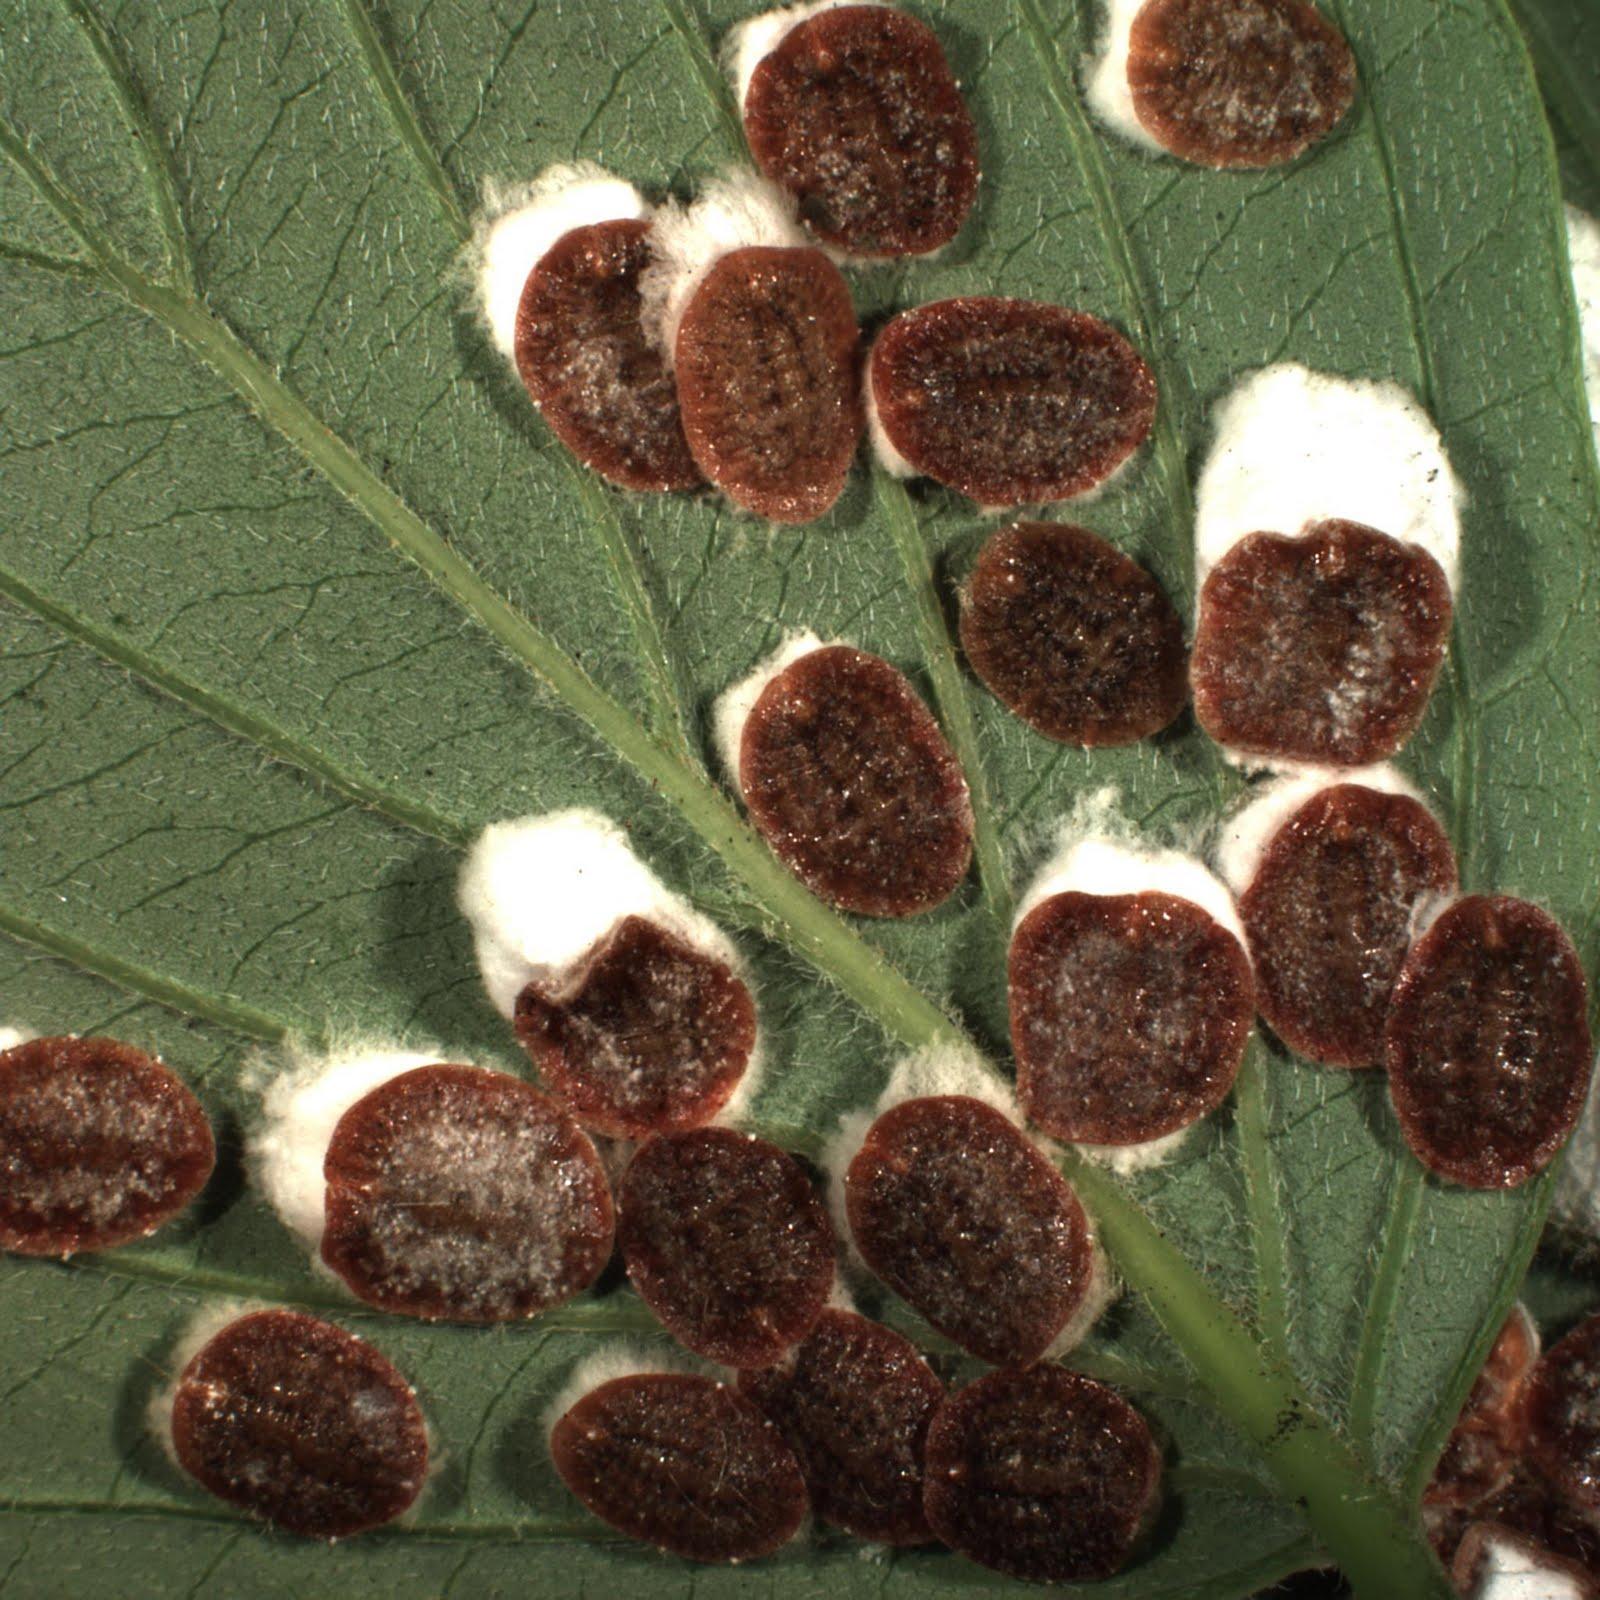 Cottony Maple Leaf Scale Ornamentals Diagnostics